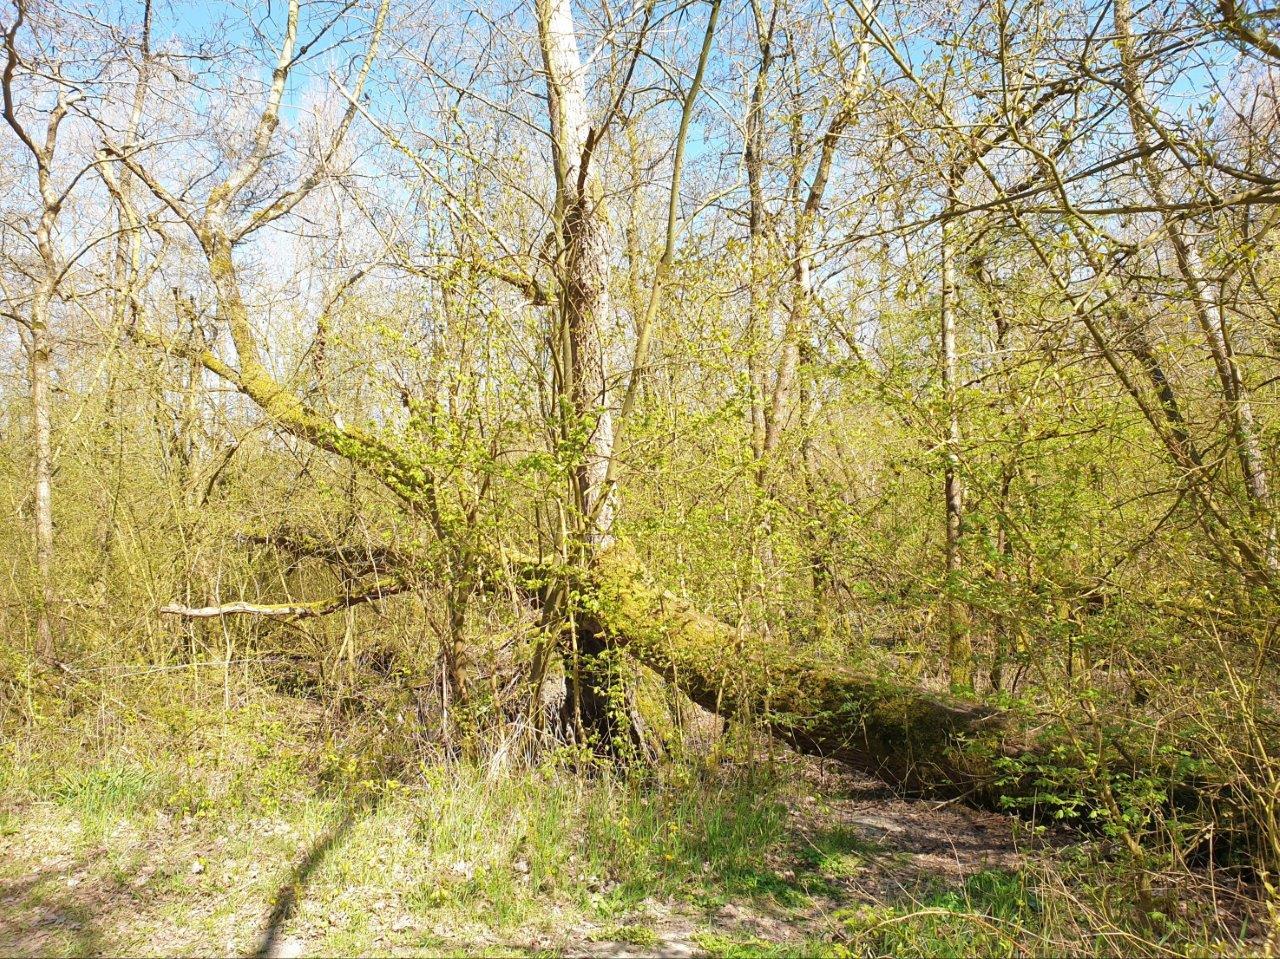 Omgevallen boom groeit verder